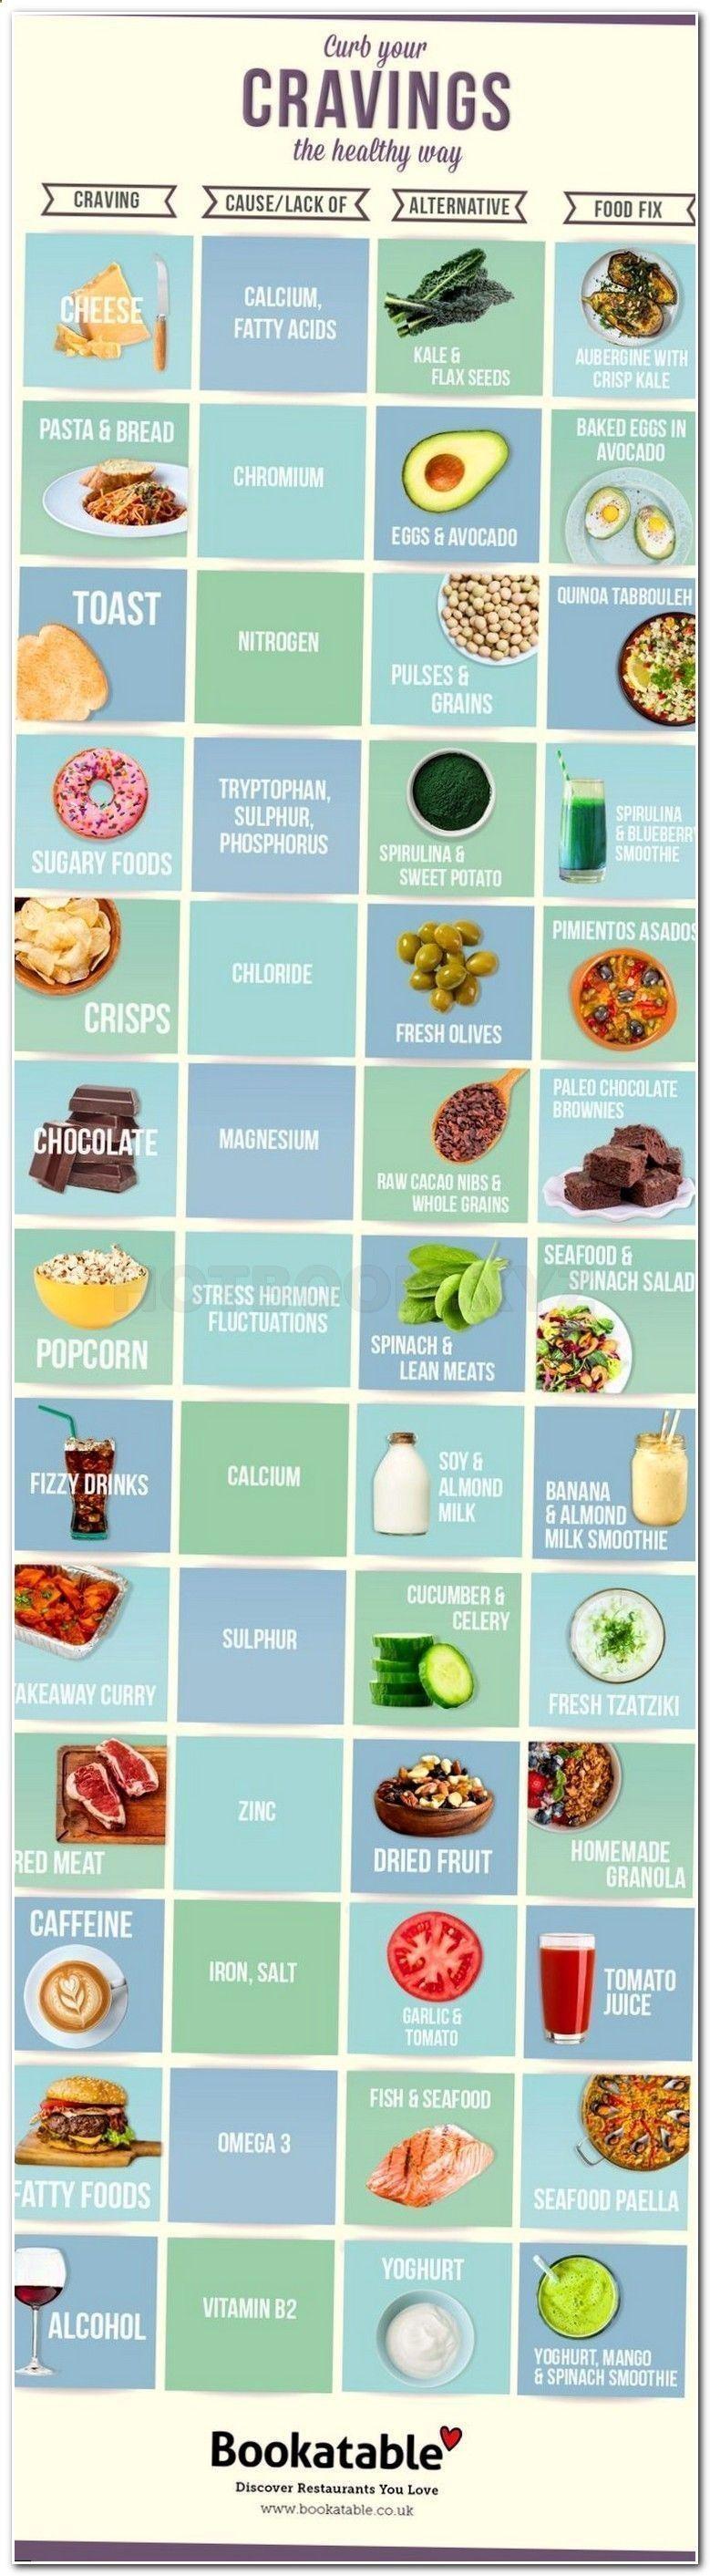 1250 diet plan on a budget